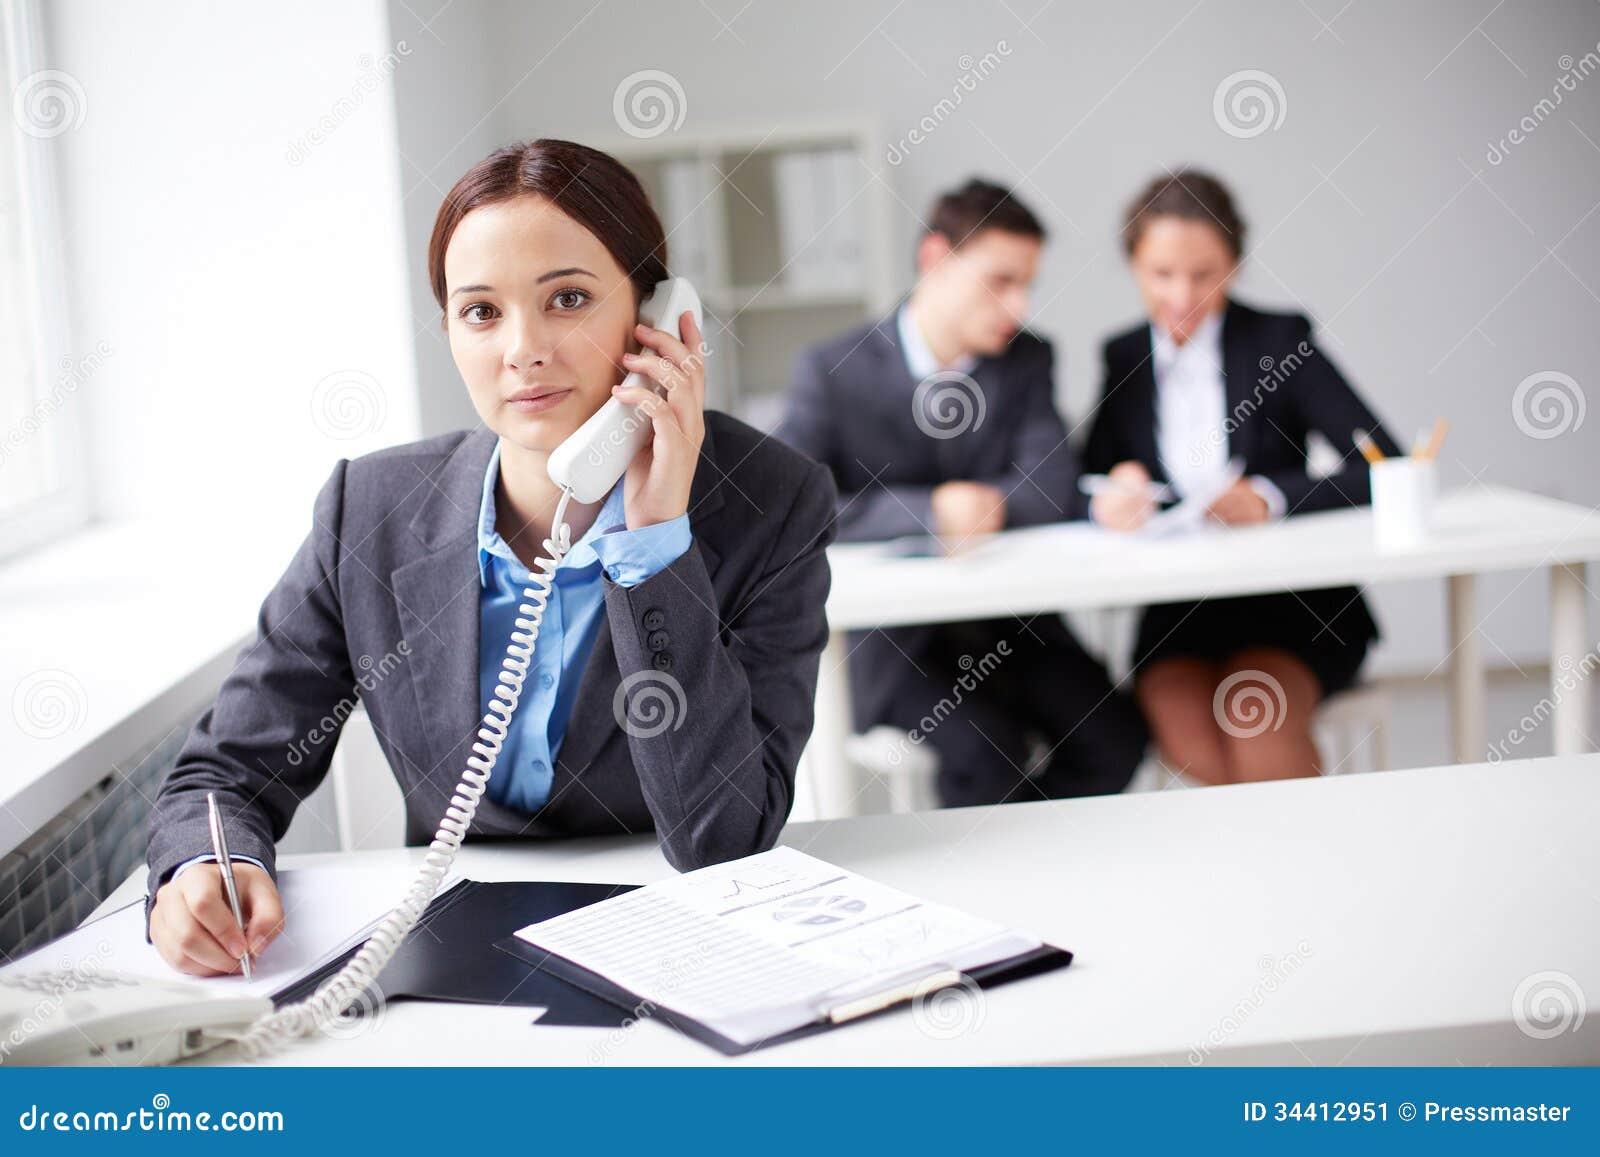 Request A Phone Consultation - Donaldson Williams |Telephone Consultation